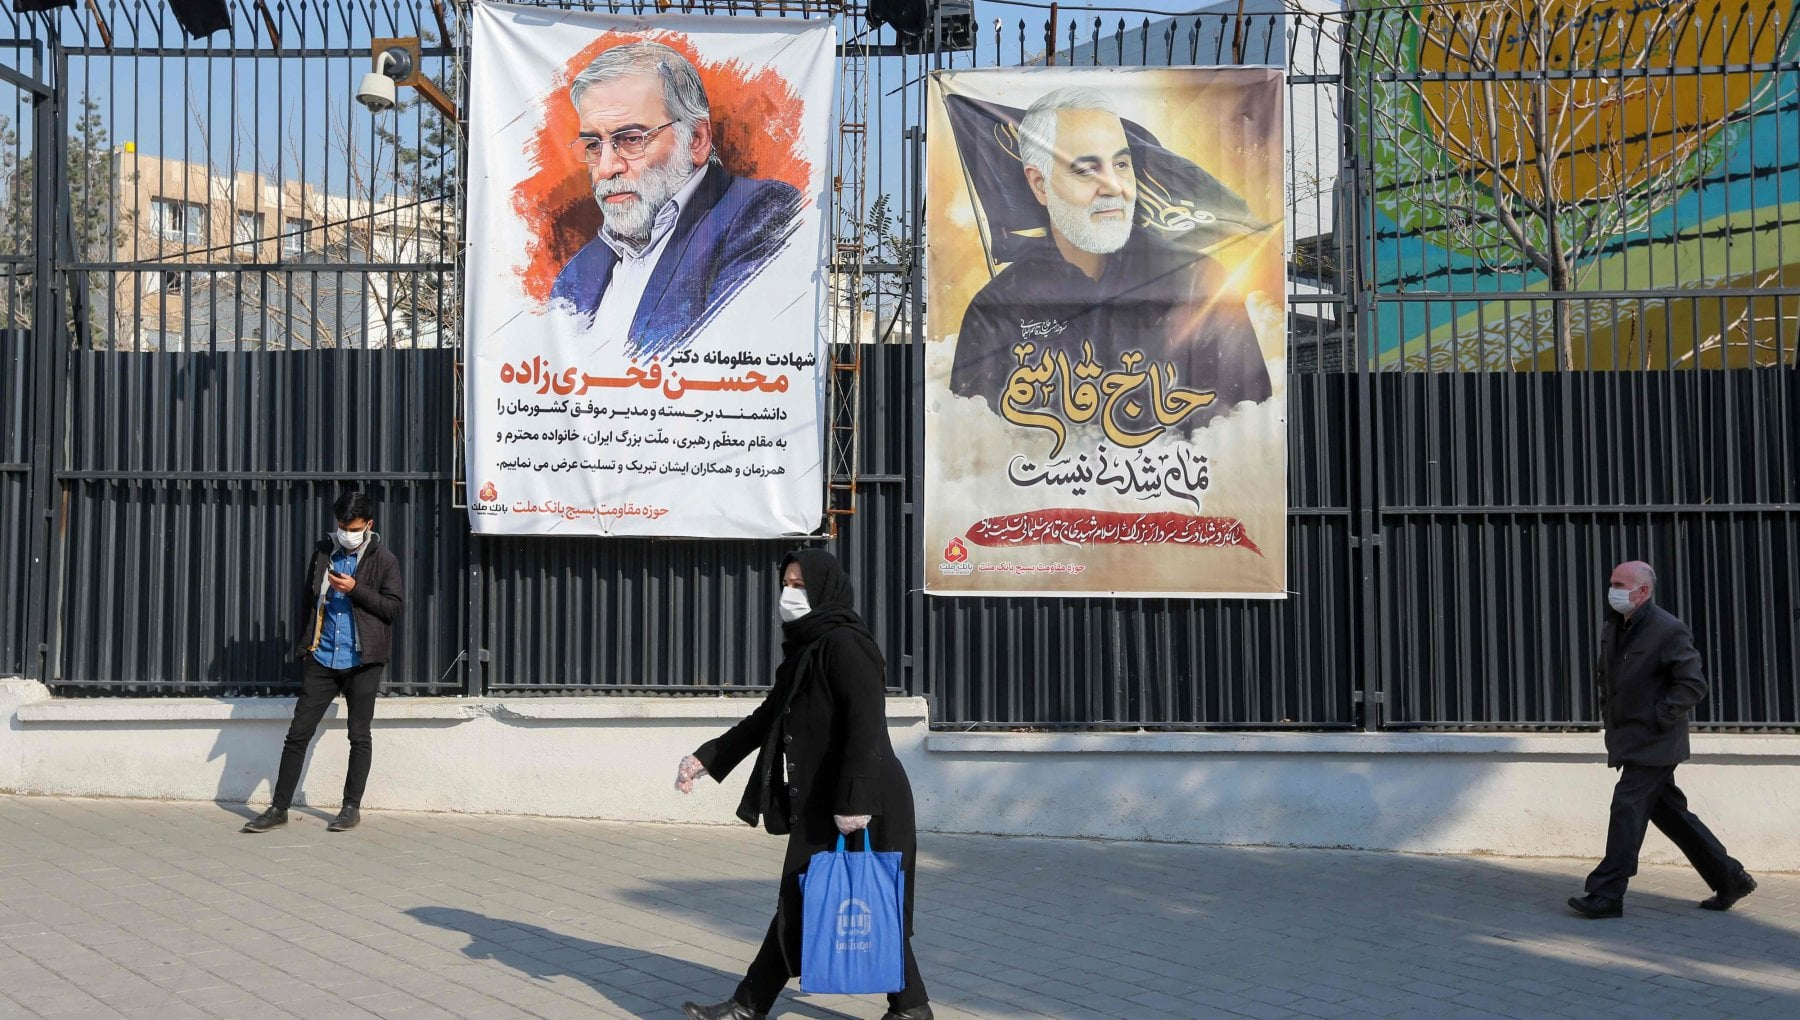 090142226 3b8fe21f 8f30 48e1 8b7e 1023d1b09522 - Nucleare, Teheran minaccia di arricchire l'uranio al 20%